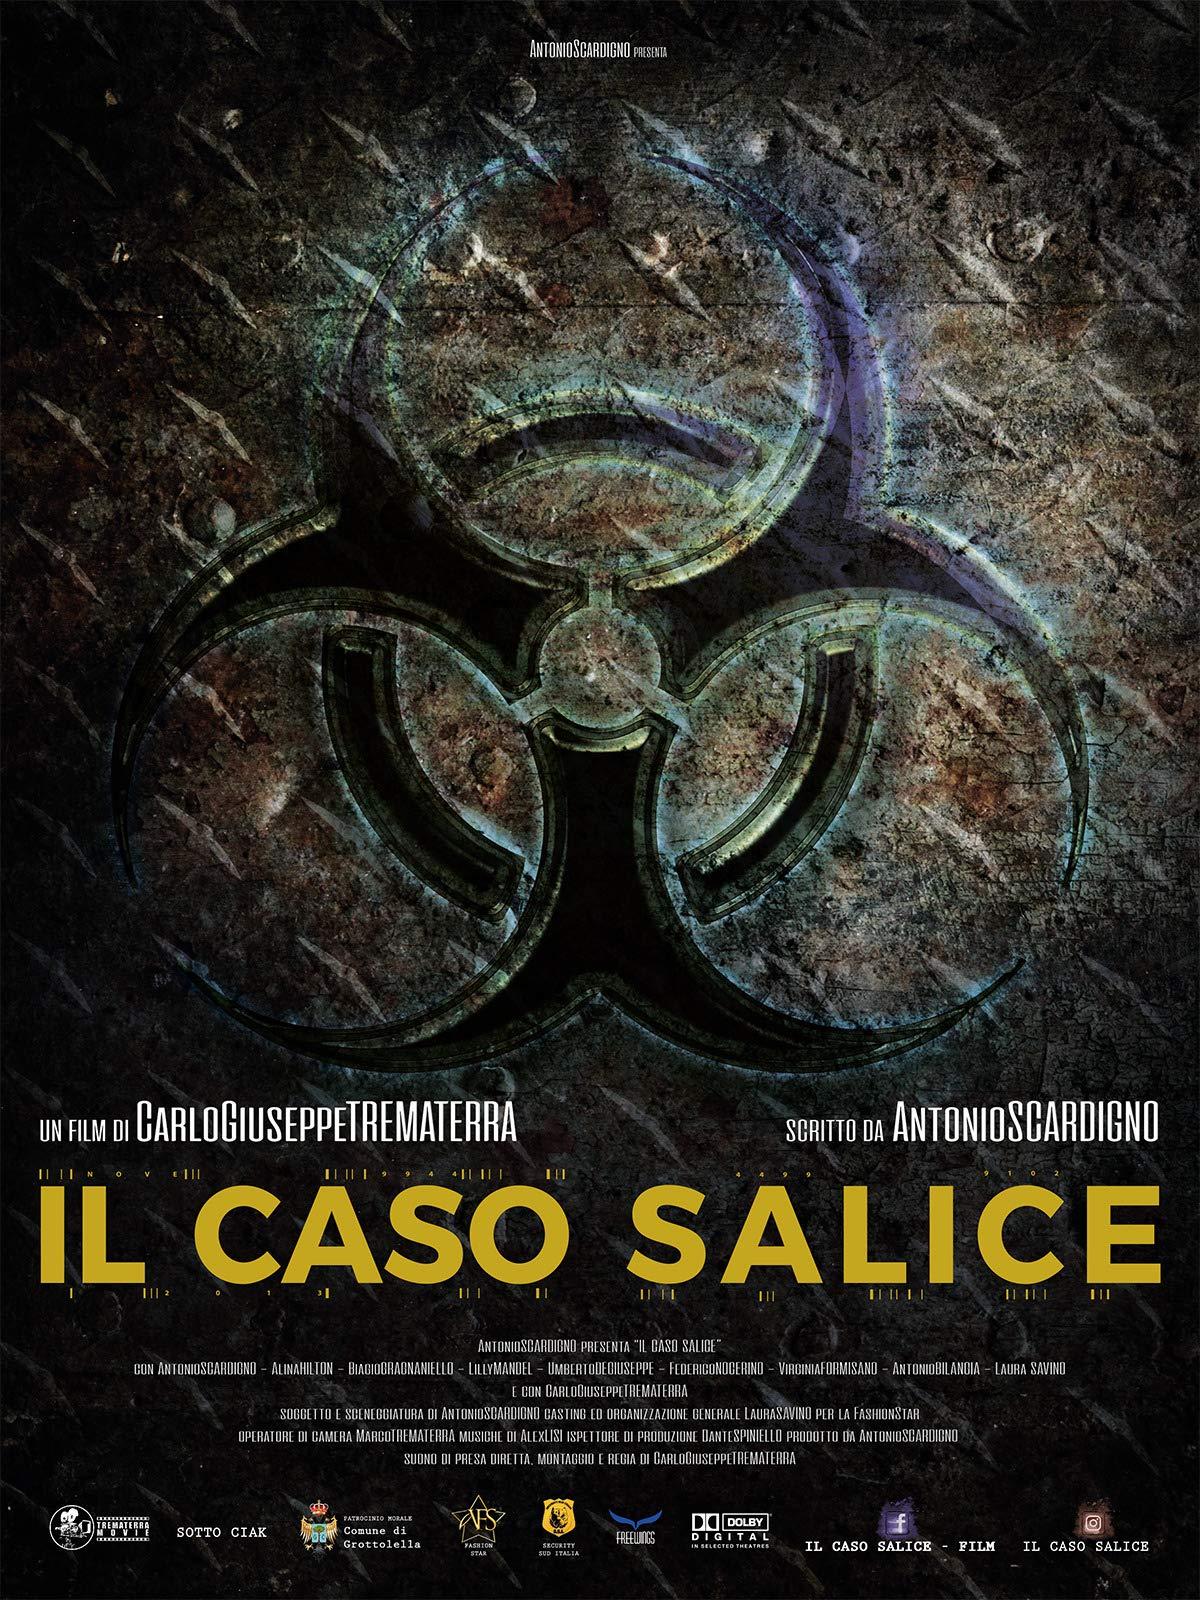 Salice's case - Il caso Salice